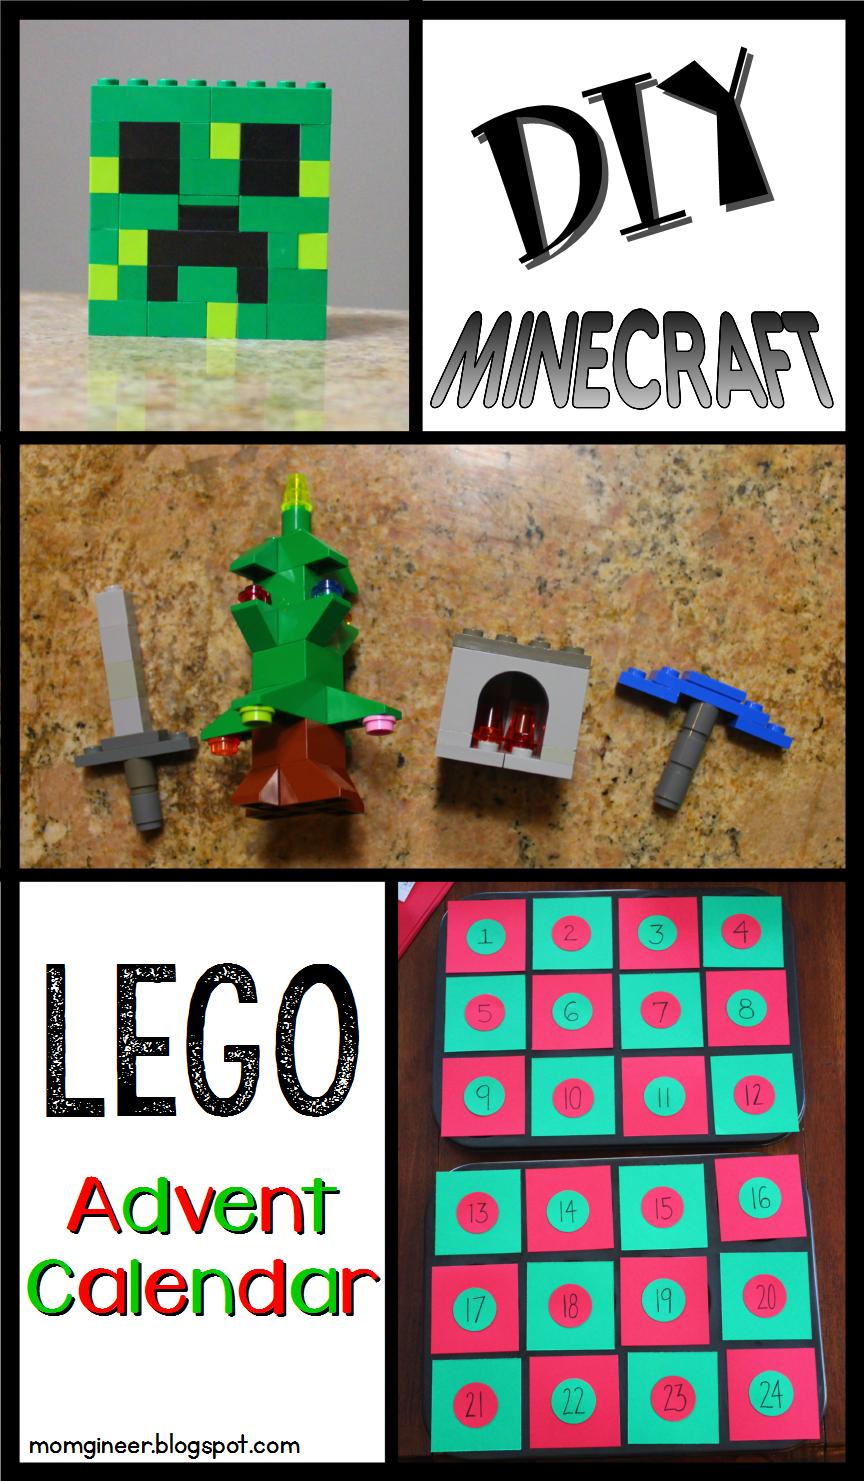 Advent Calendar Diy Template : Lego diy advent calendar search results